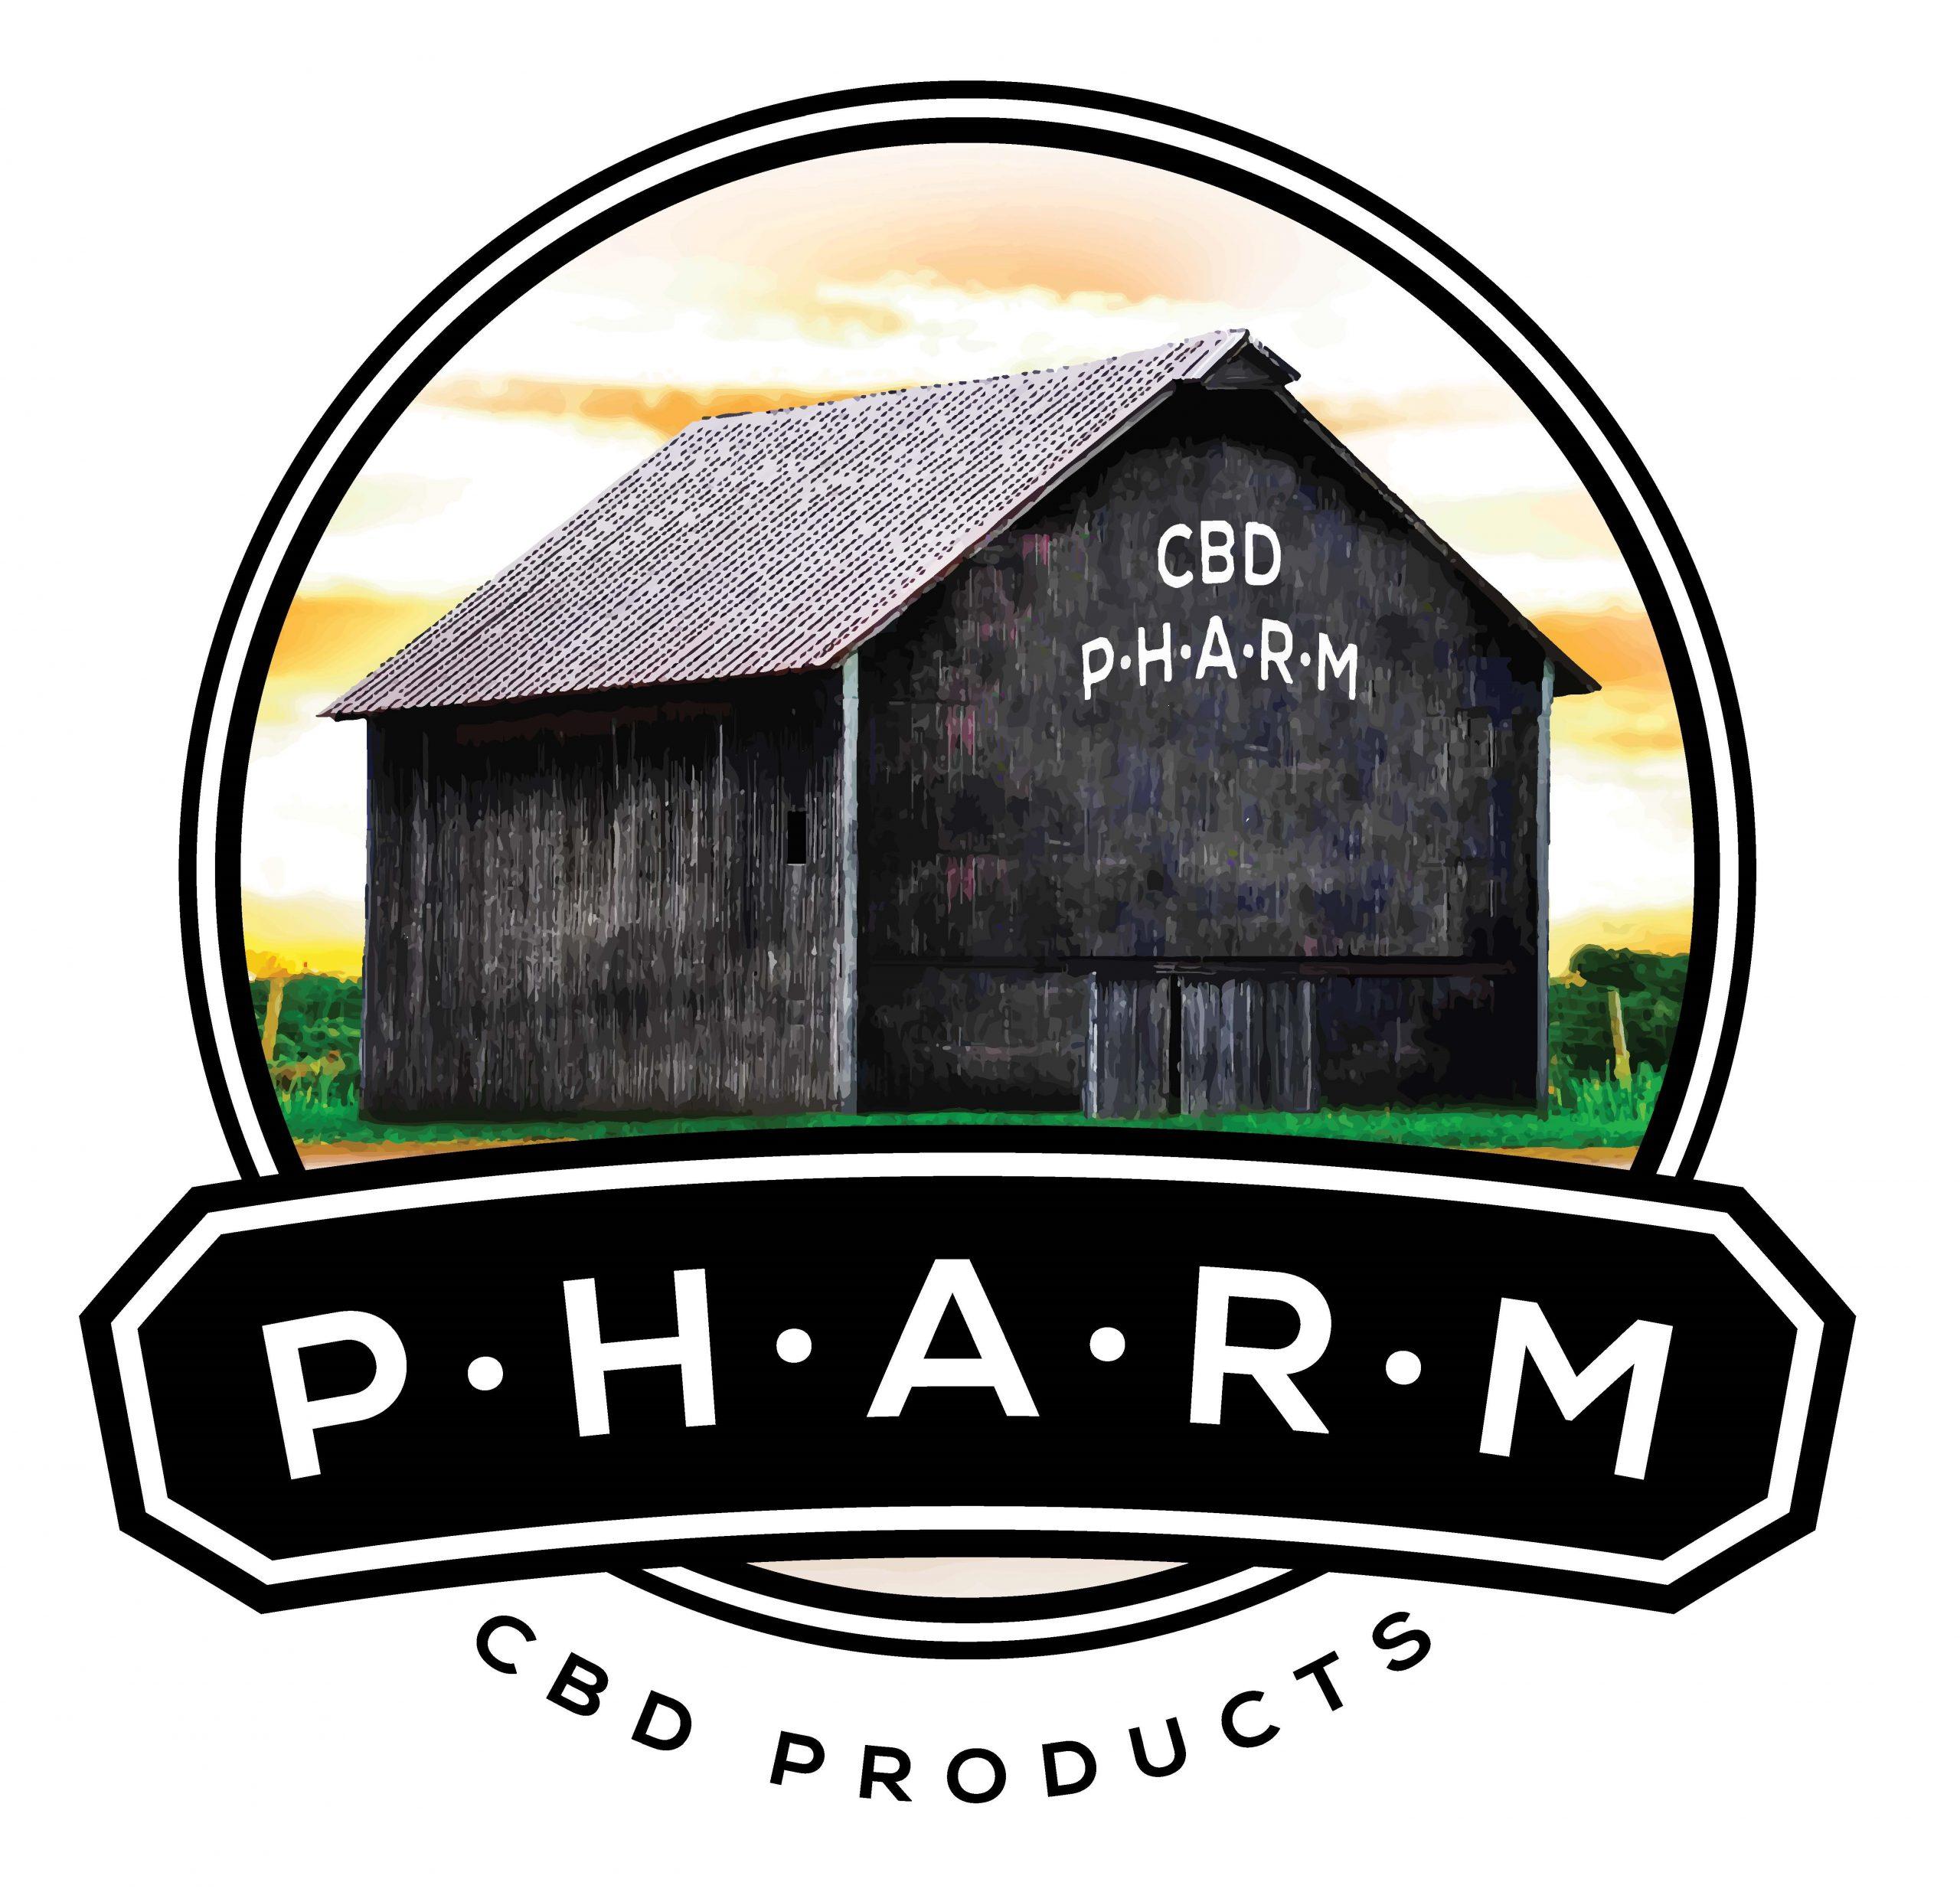 P•H•A•R•M CBD